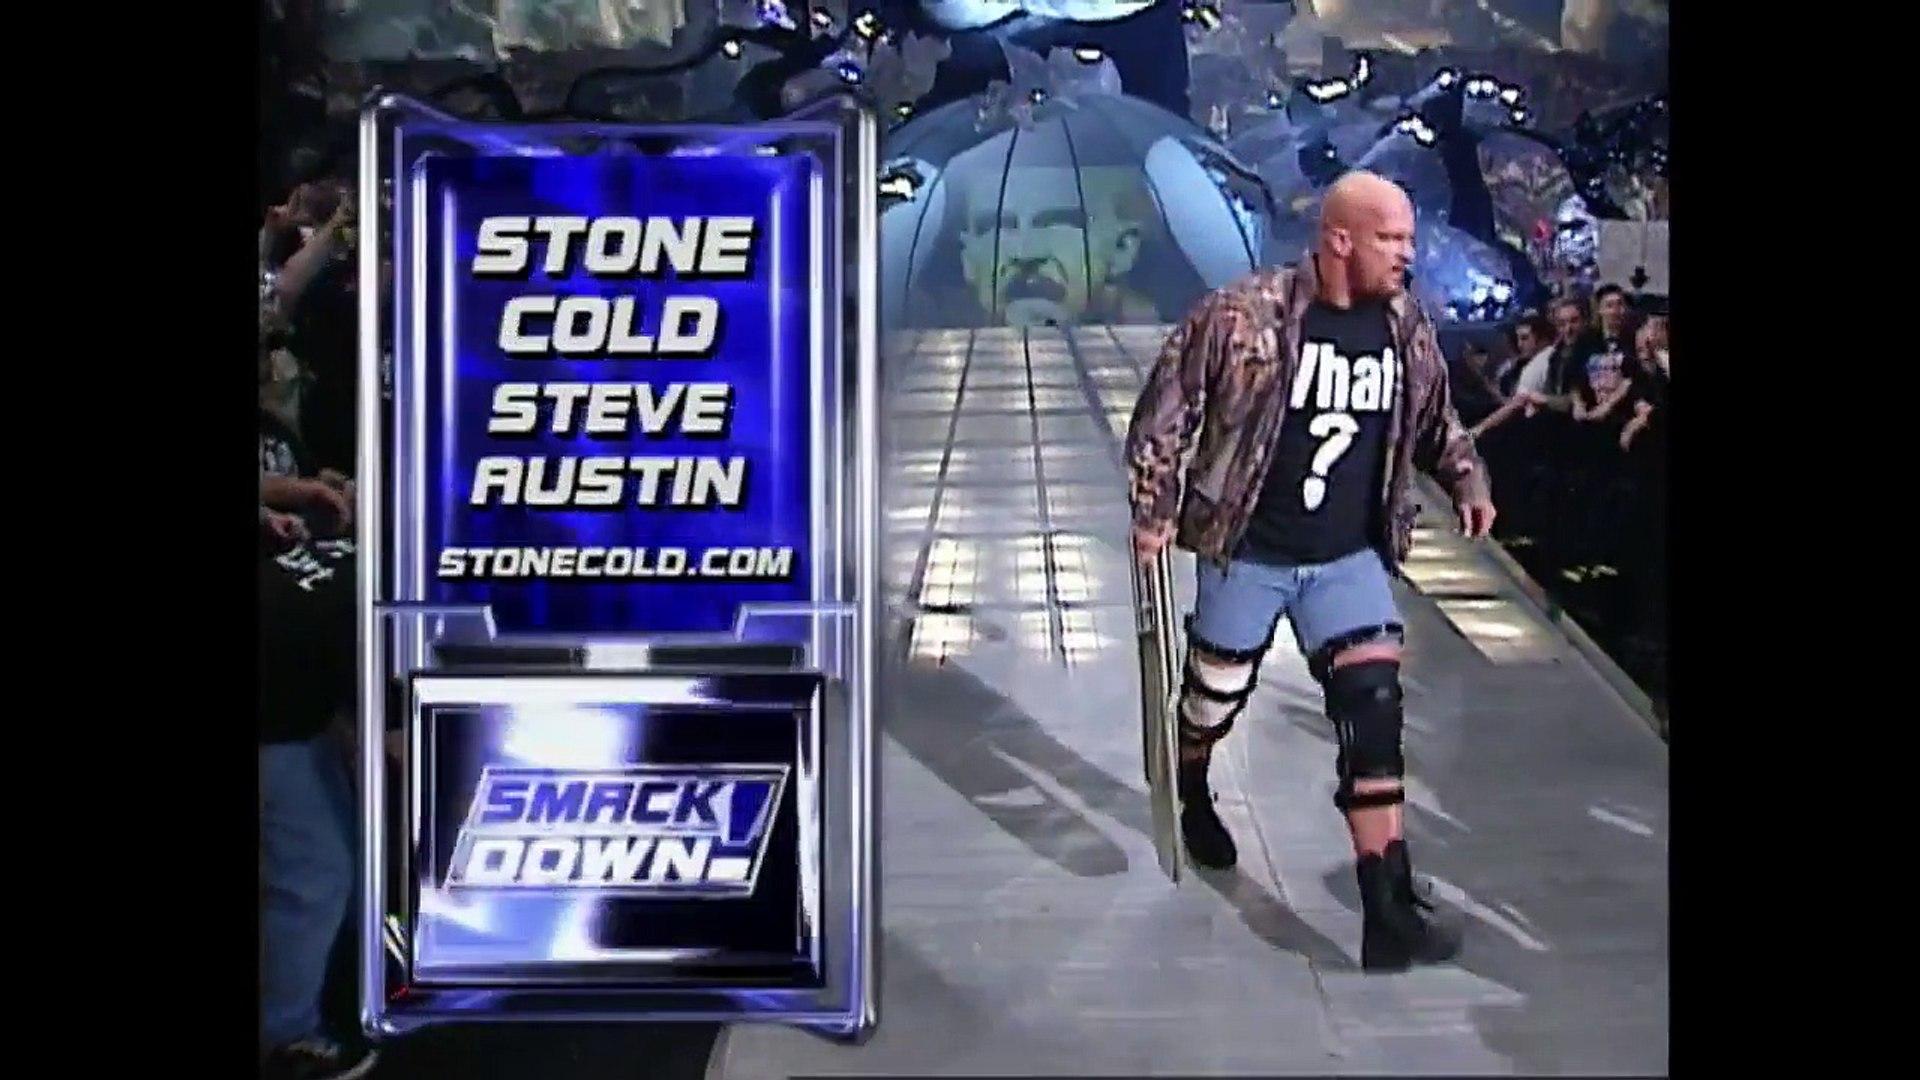 Stone Cold Steve Austin no regresará al ring